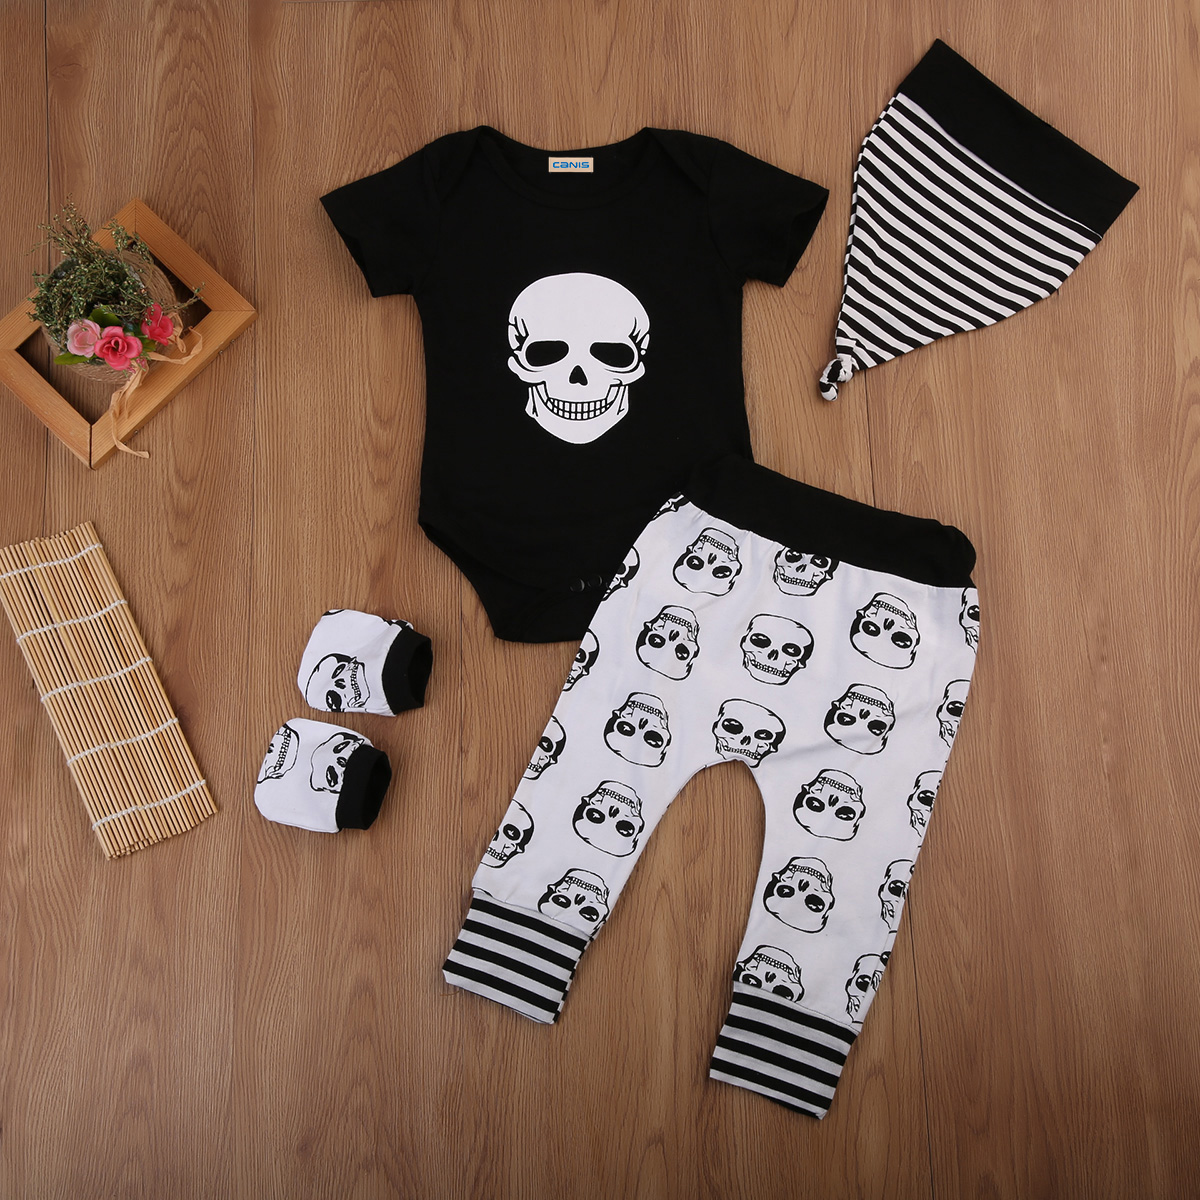 Newborn Kids Baby Boys Skull Tops Romper Long Pants Hat 4Pcs Outfits Set Clothes